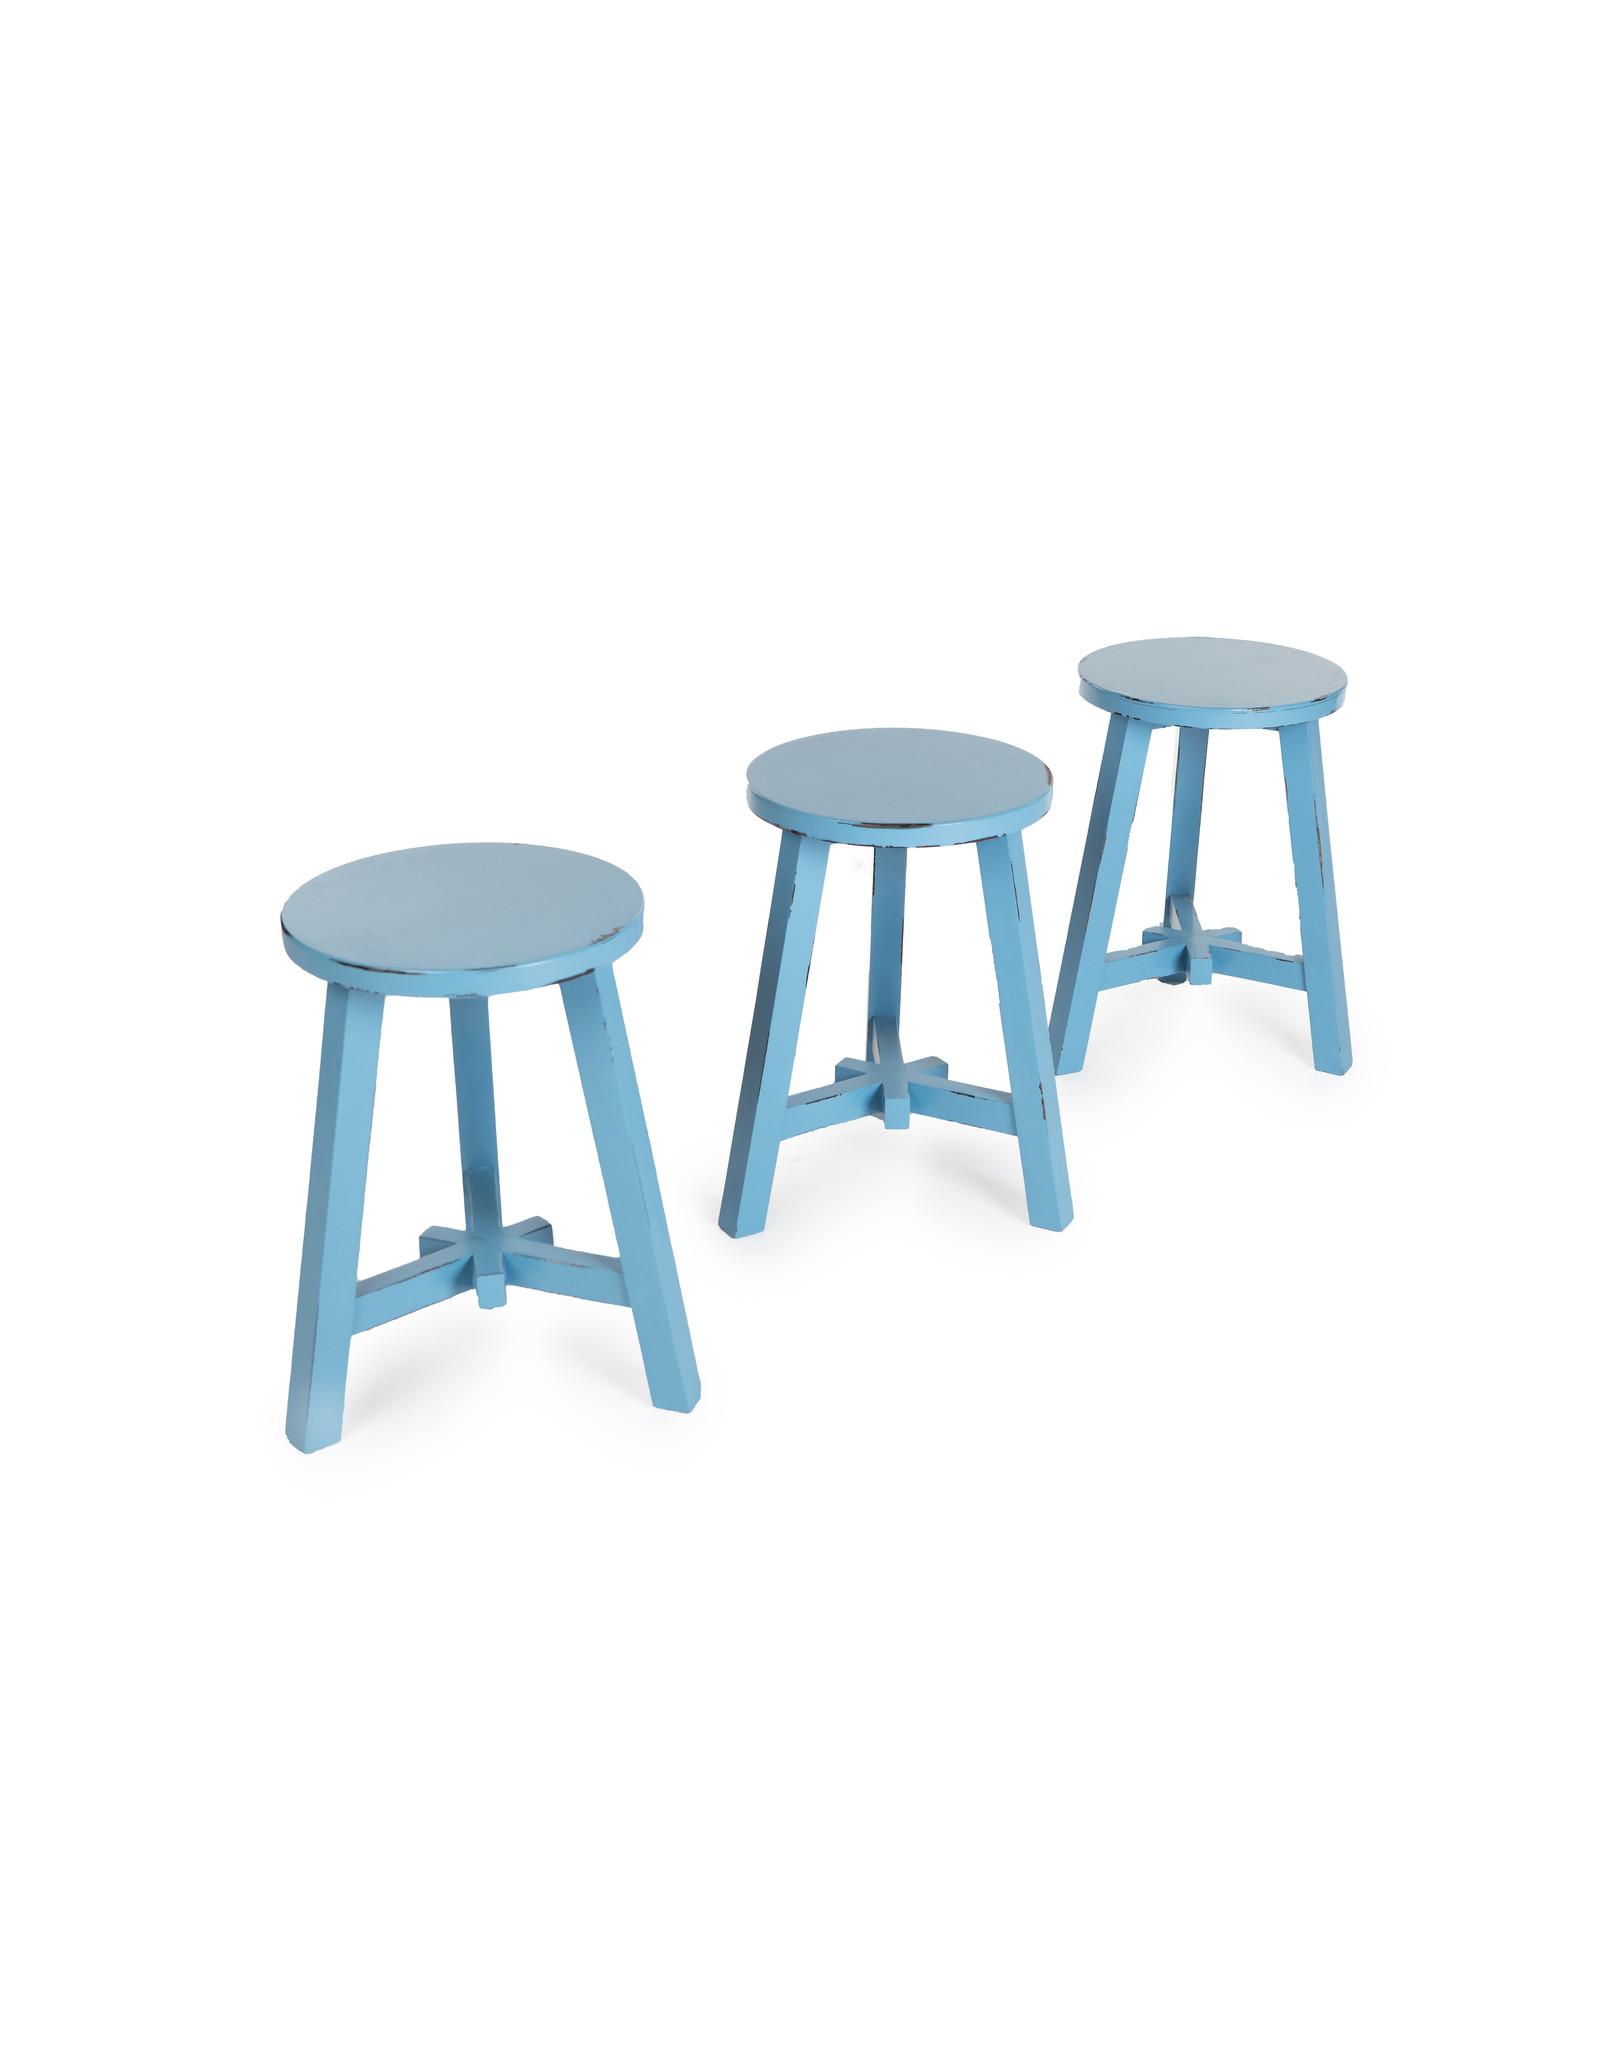 round wooden stool - blue